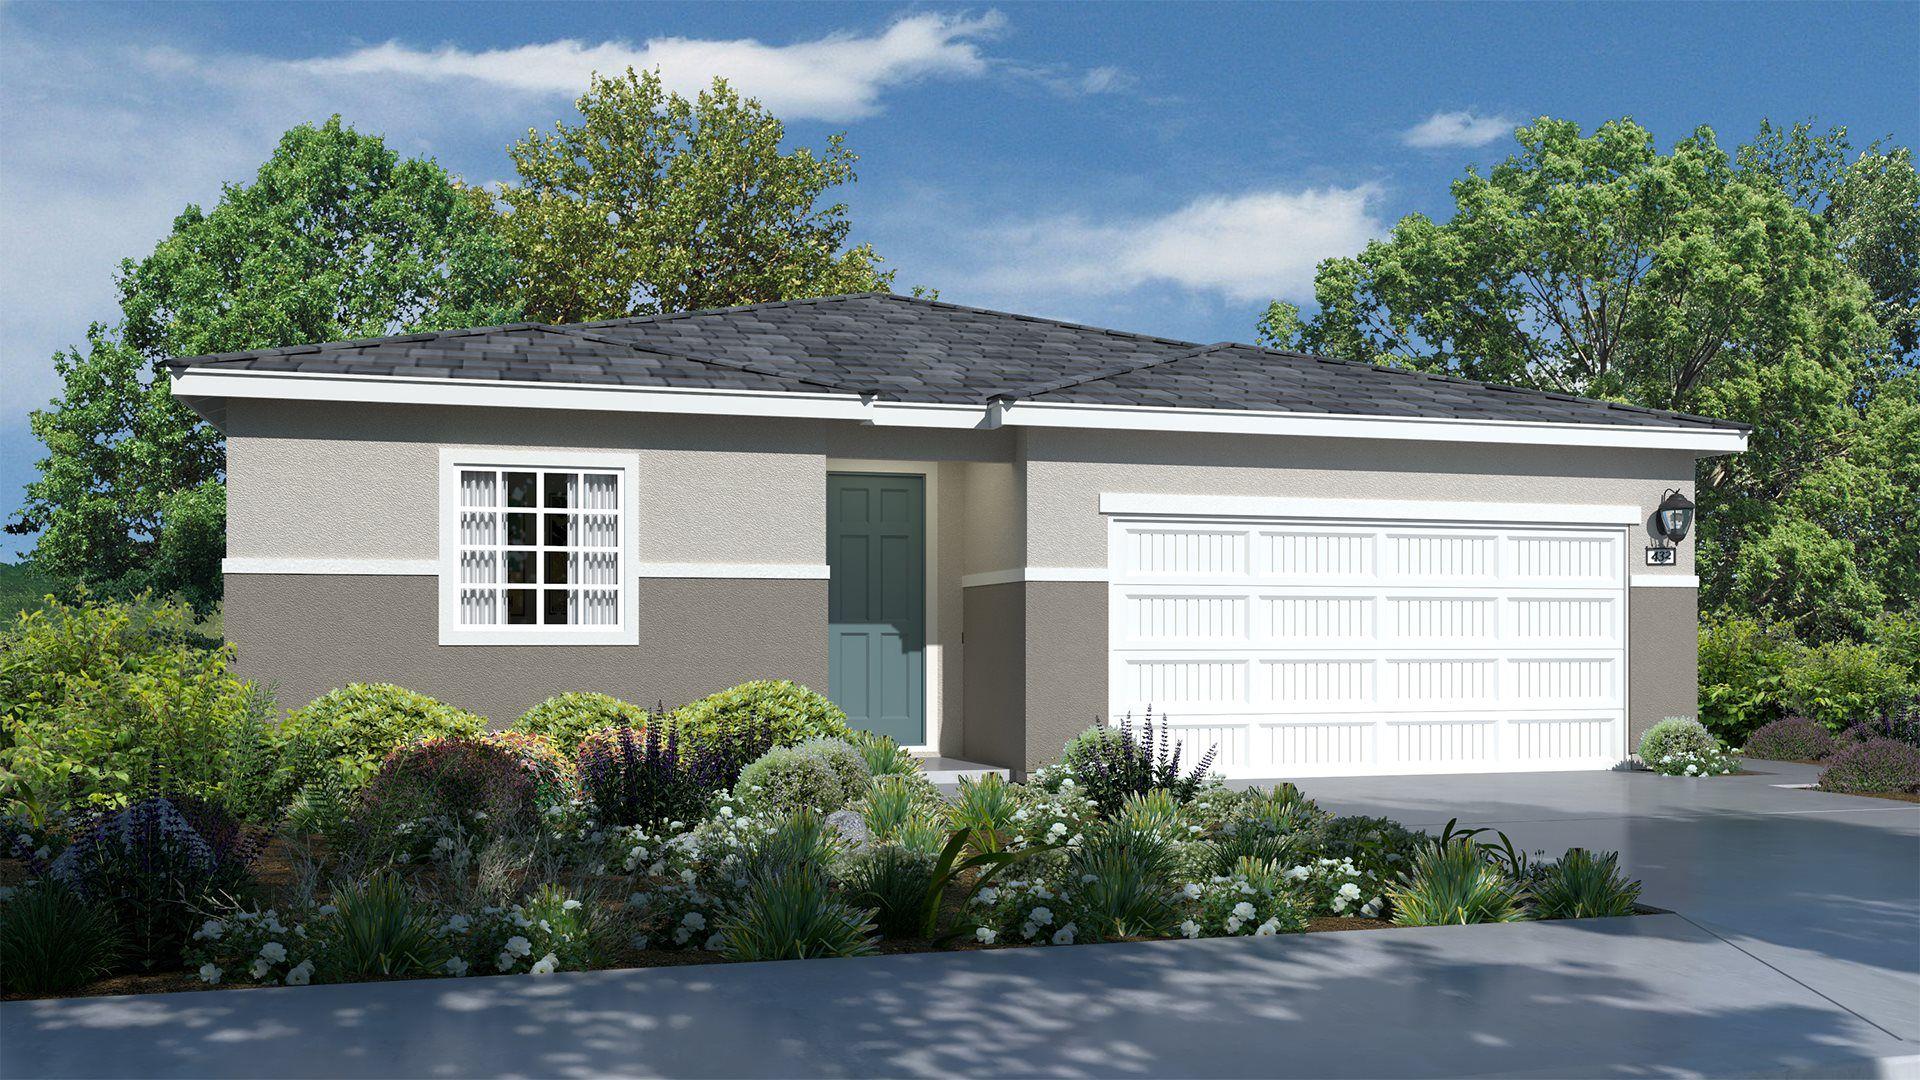 Residence 1951 | Elevation C